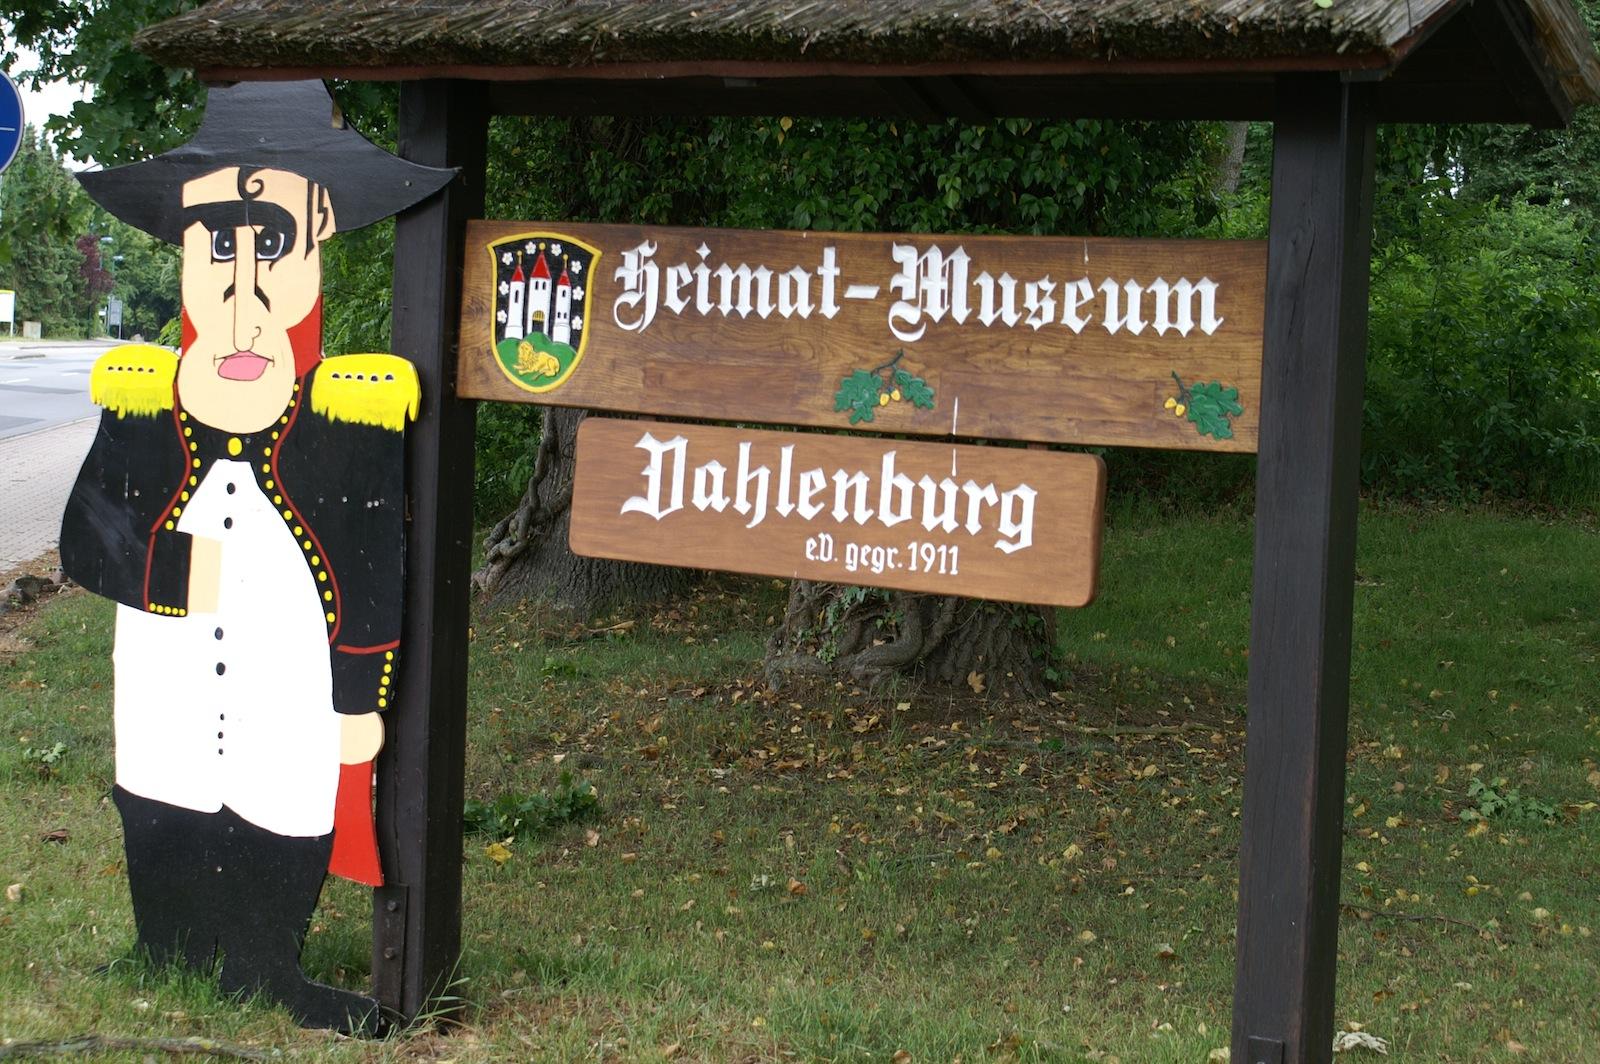 museumdahlenburg.jpg